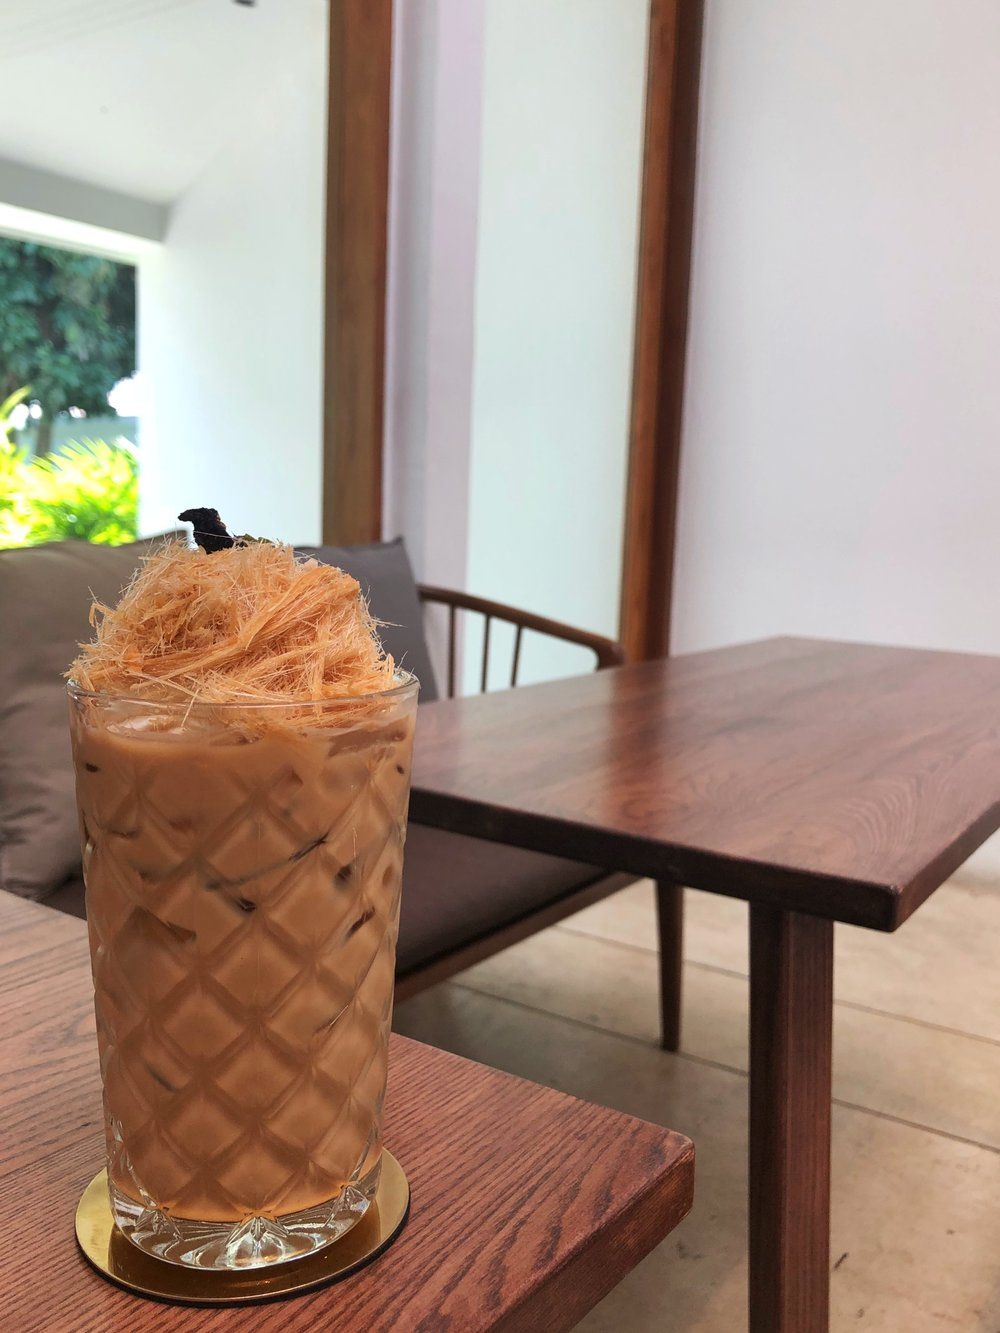 Busaba Cafe & Meal ice busaba latte